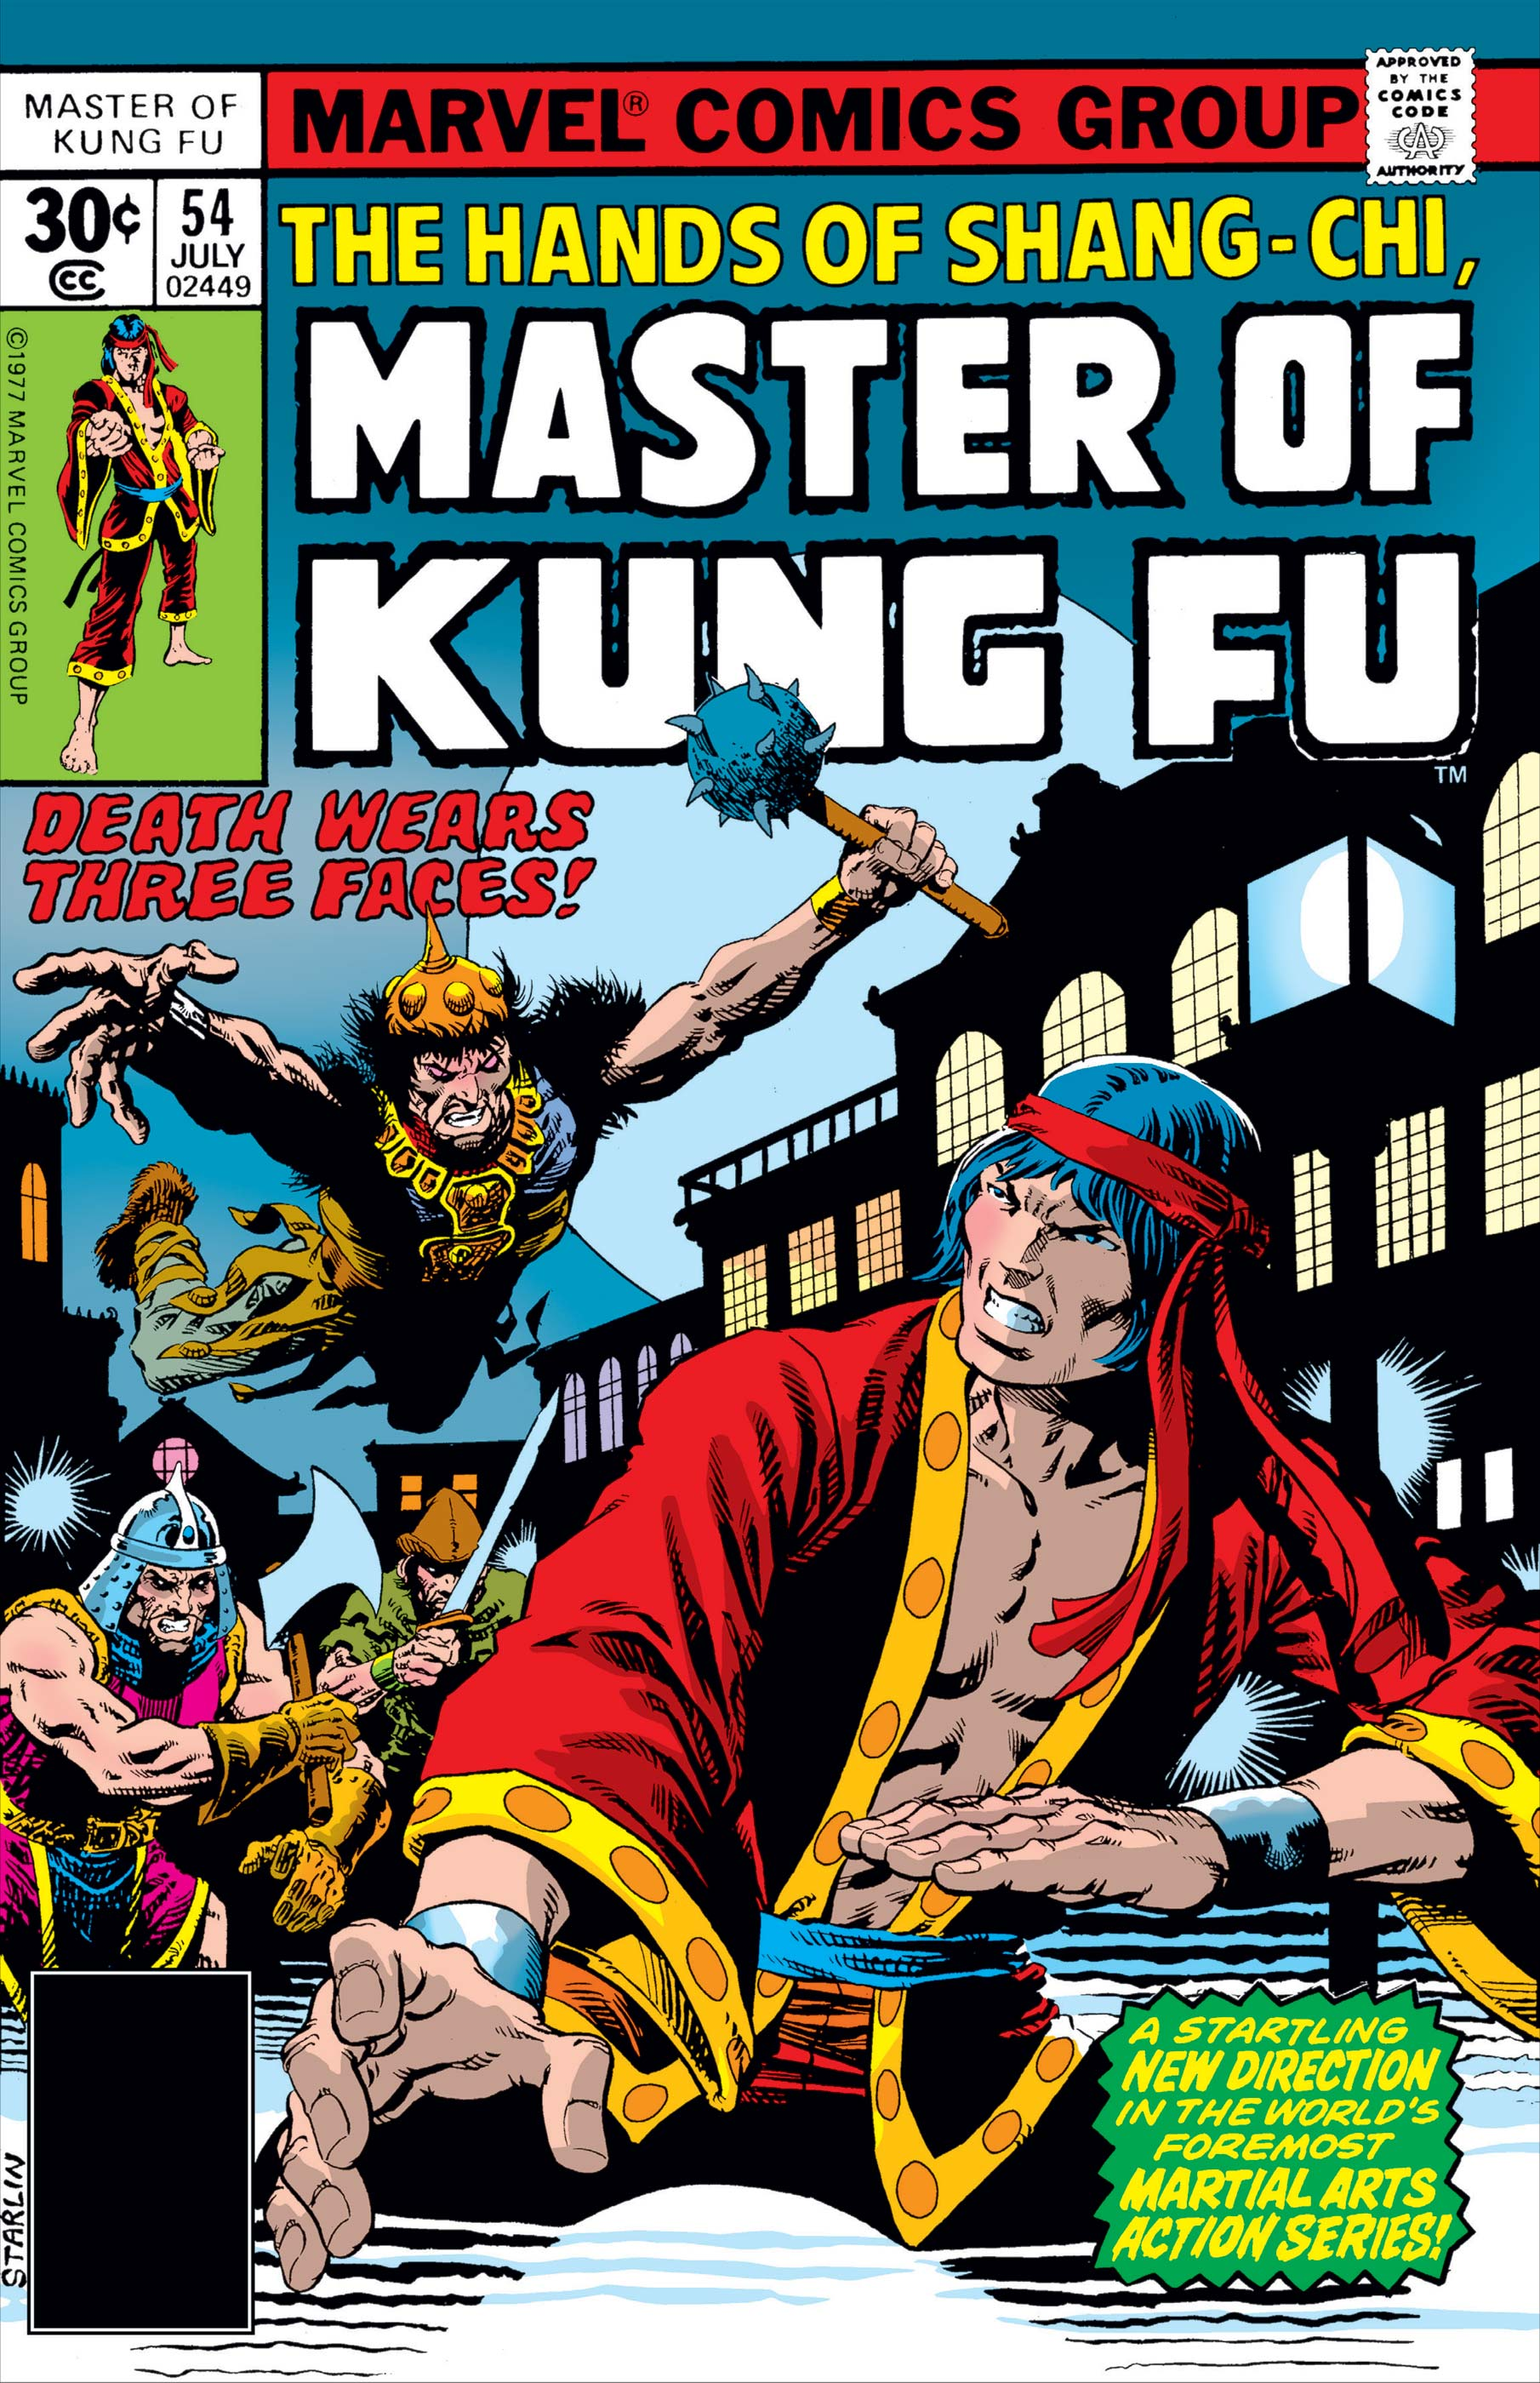 Master of Kung Fu (1974) #54